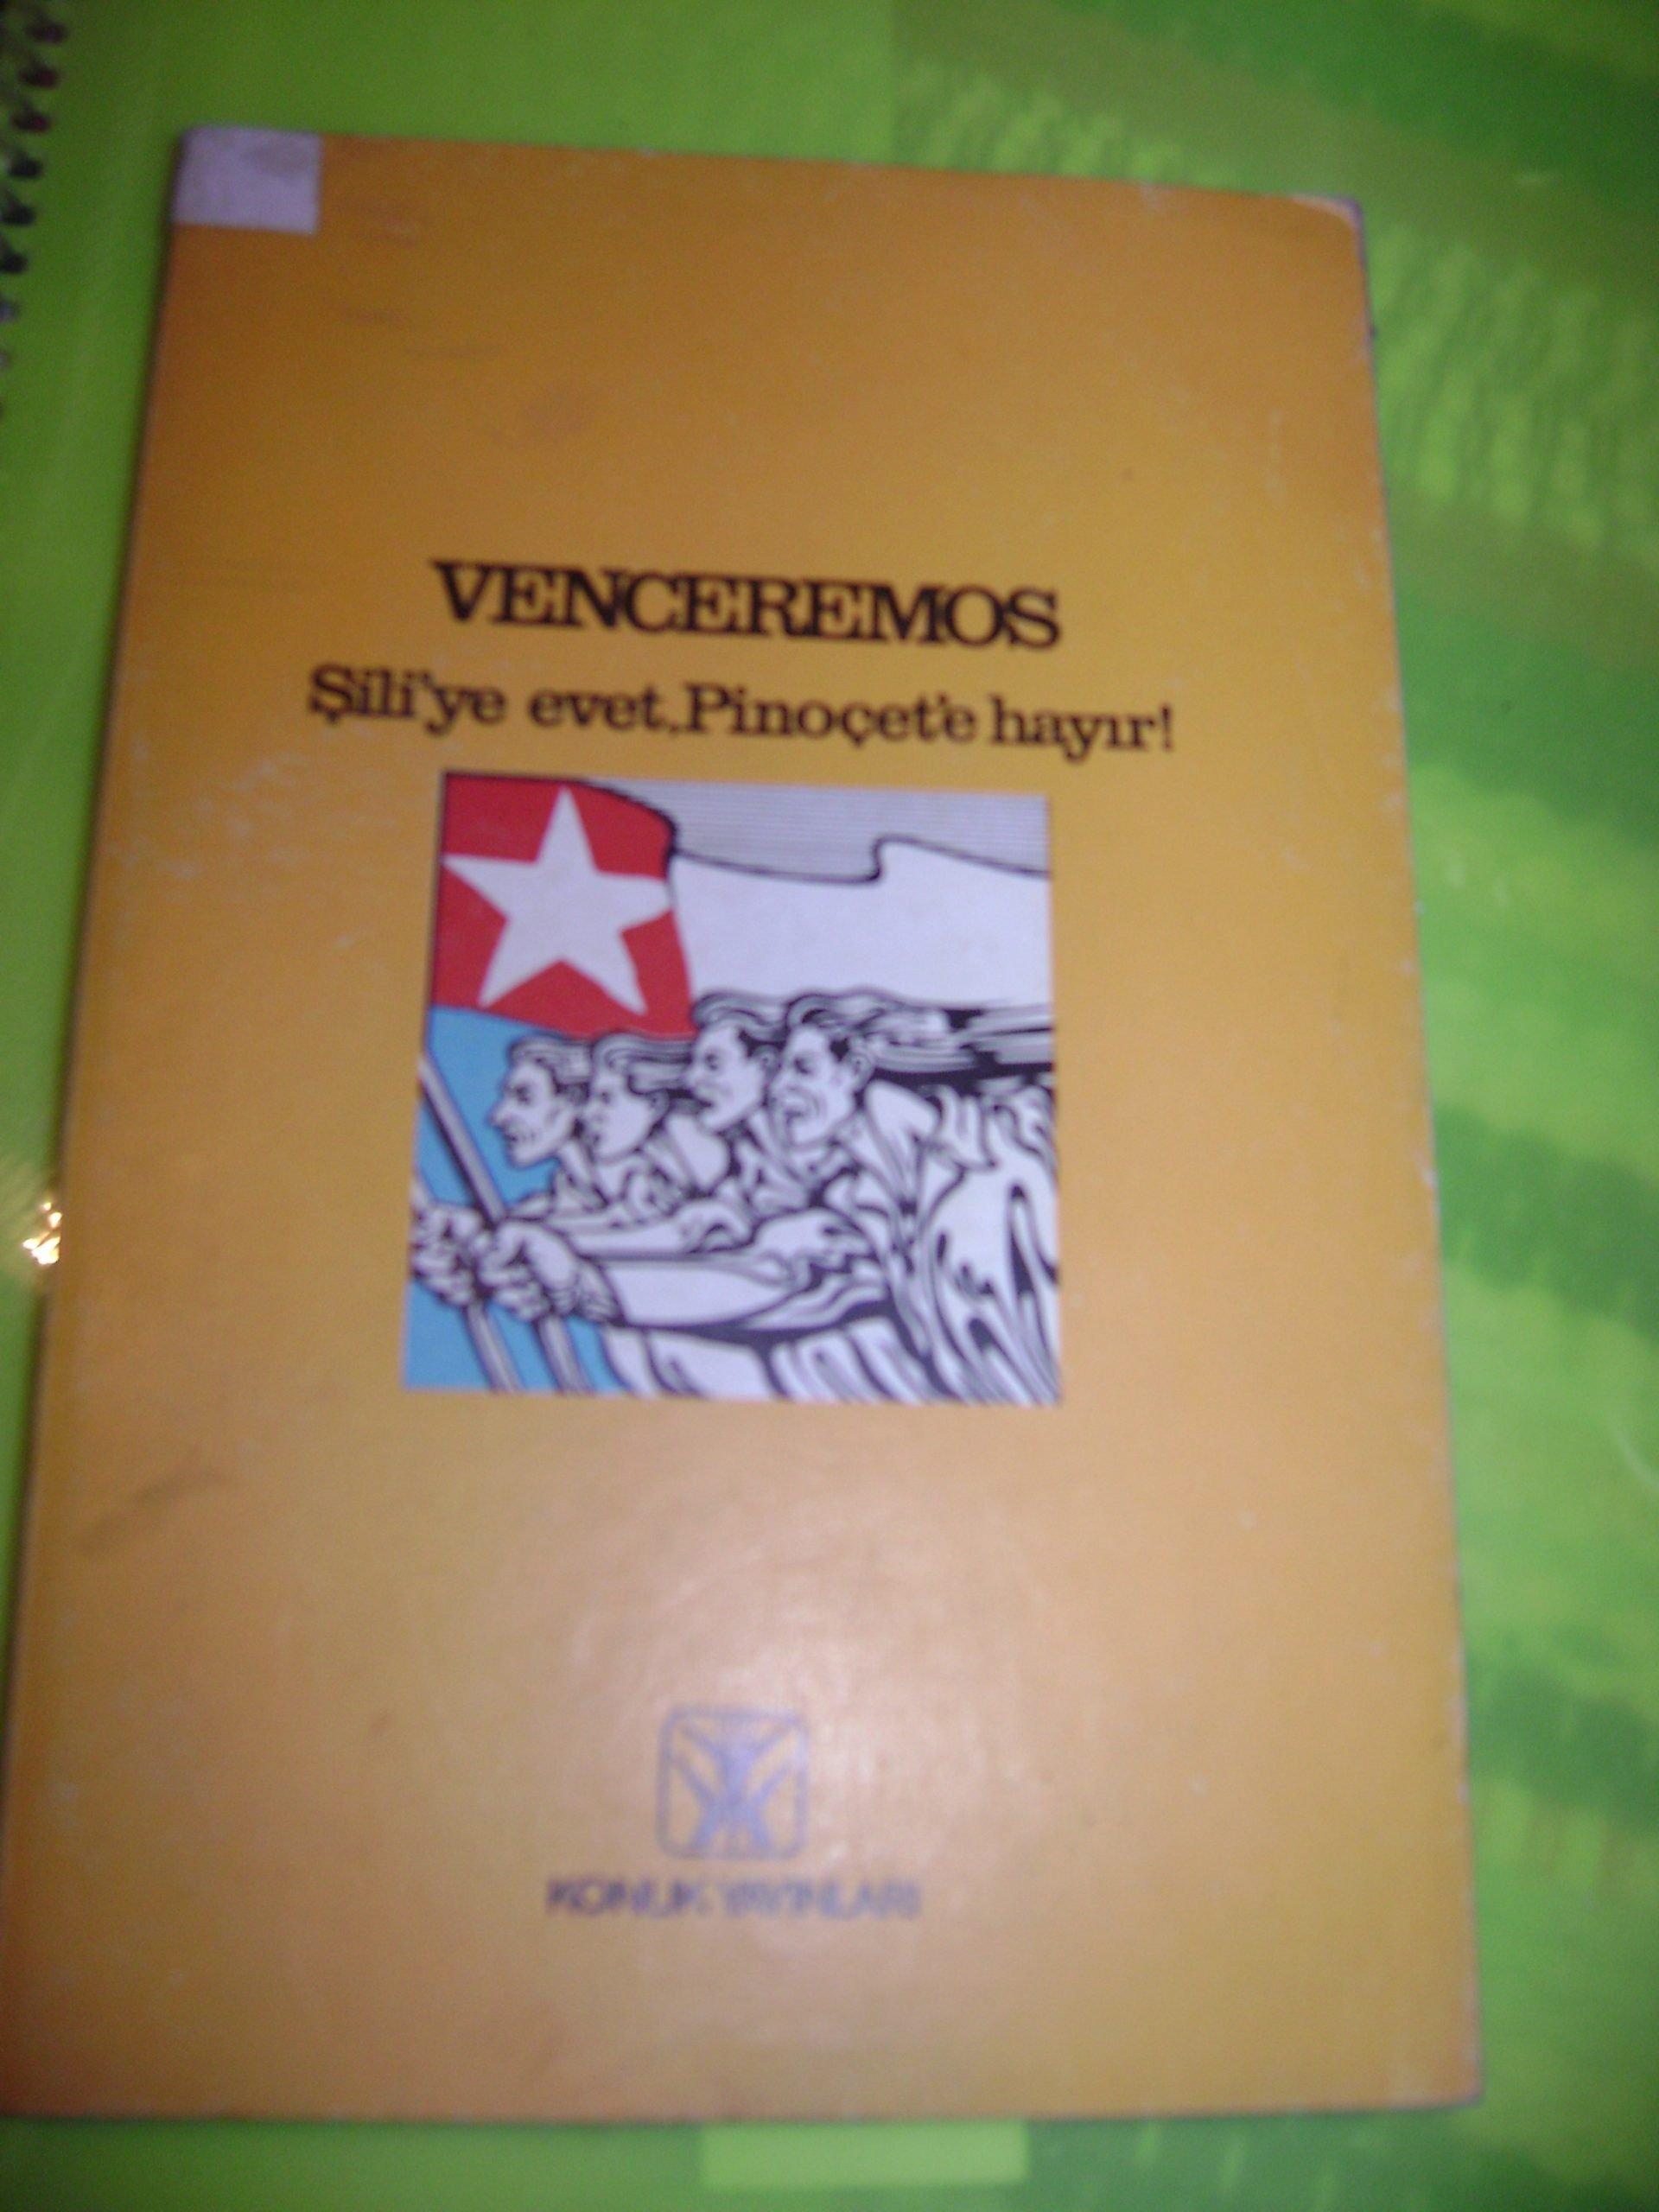 VENCEMEROS(Şili'ye evet,Pinoçet'e hayır!)/15 tl